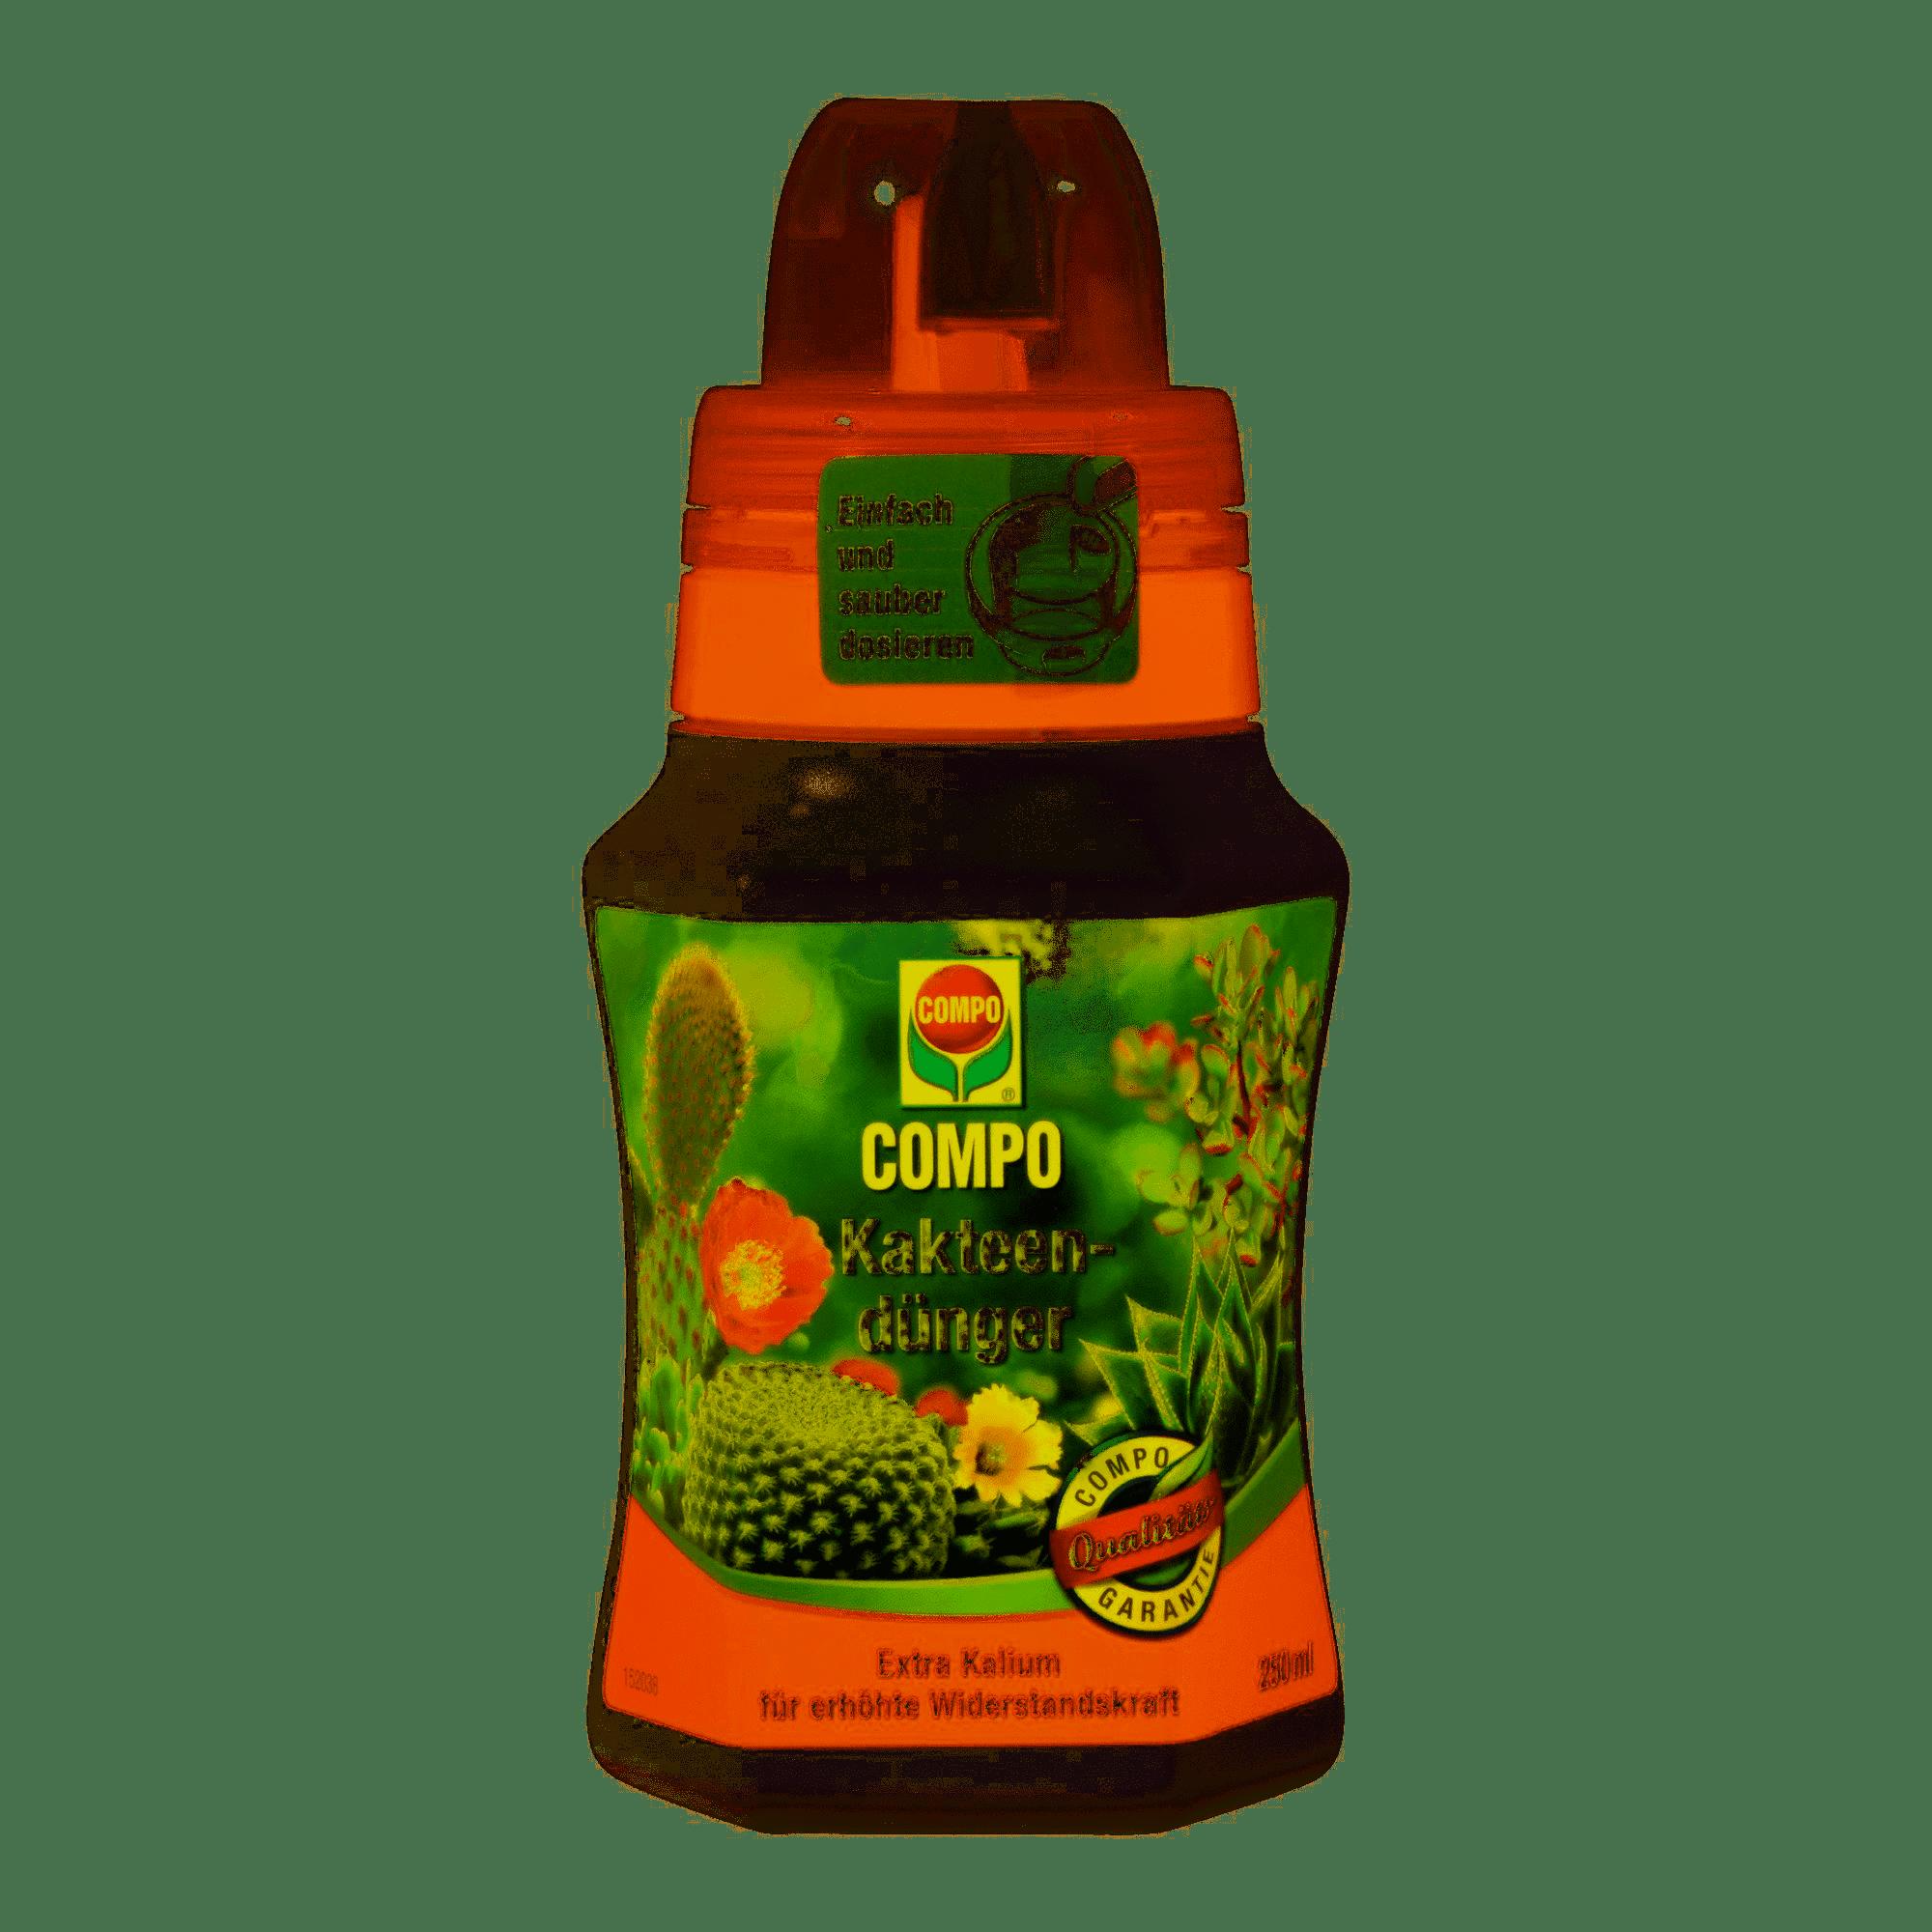 Garten k lker gr ner markt for Insektenschutznetz garten